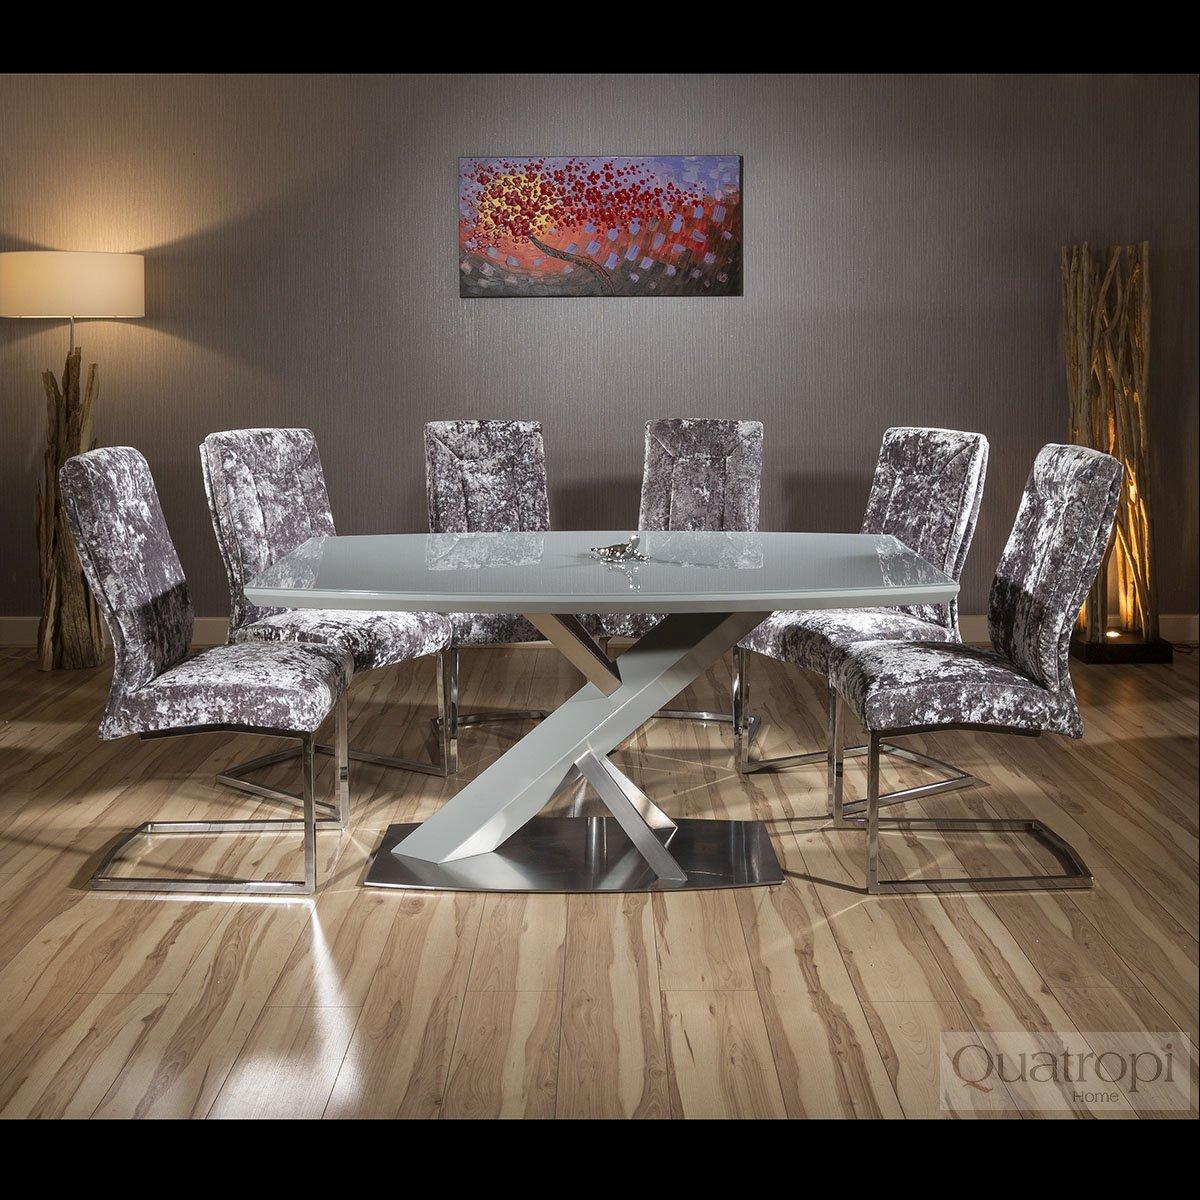 Sentinel Set Of 2 Large Super Comfy Modern Dining Chairs Silver Crushed Velvet